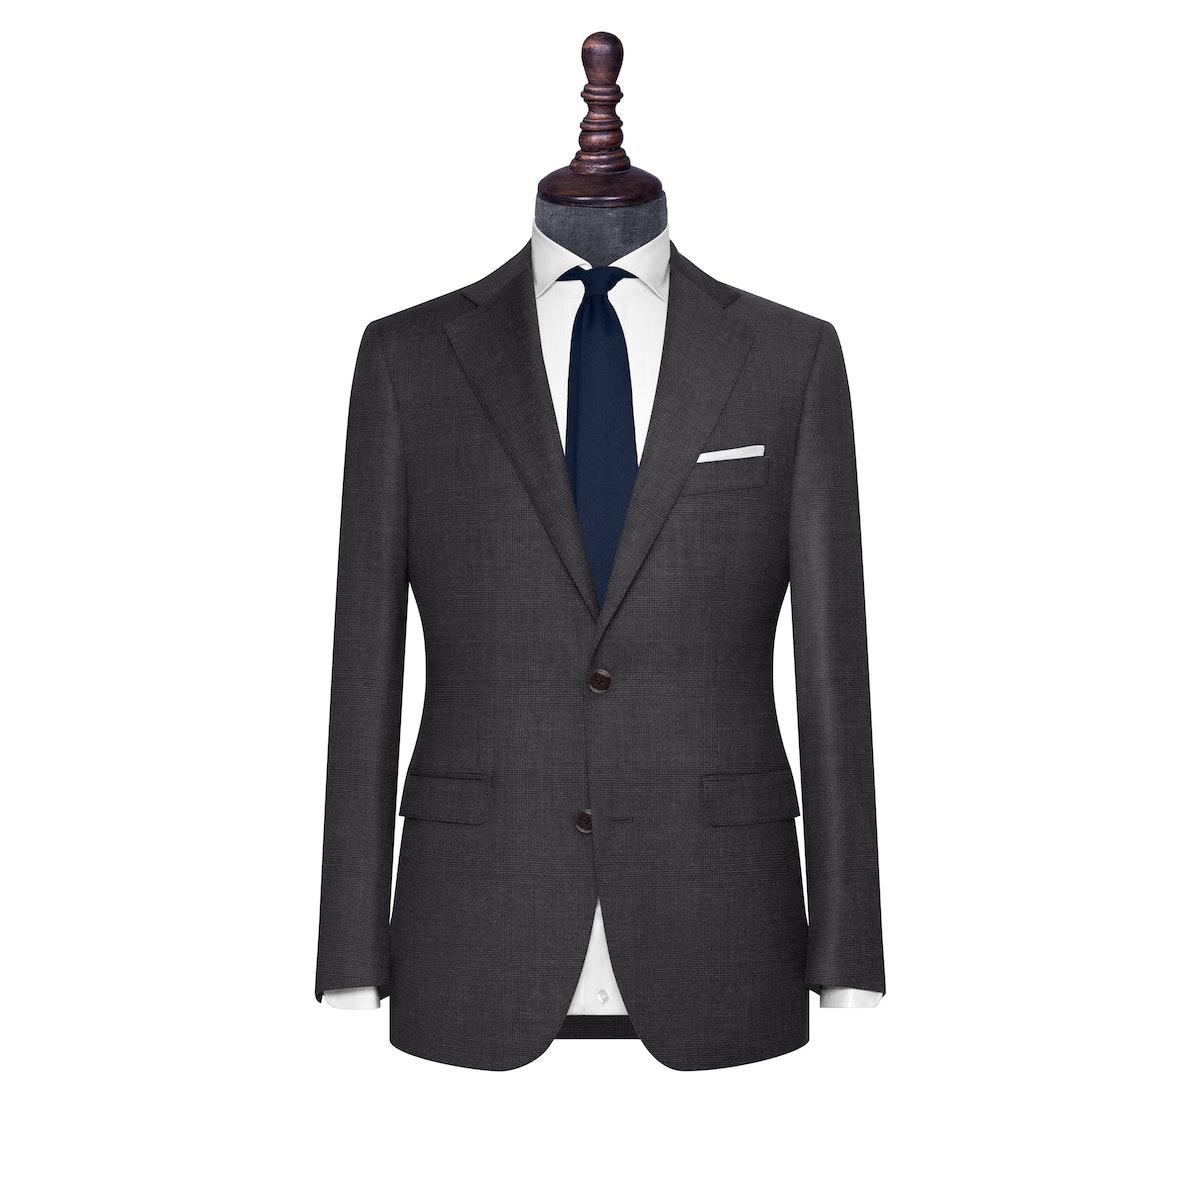 InStitchu Collection The Verona Charcoal Glen Plaid Wool Jacket